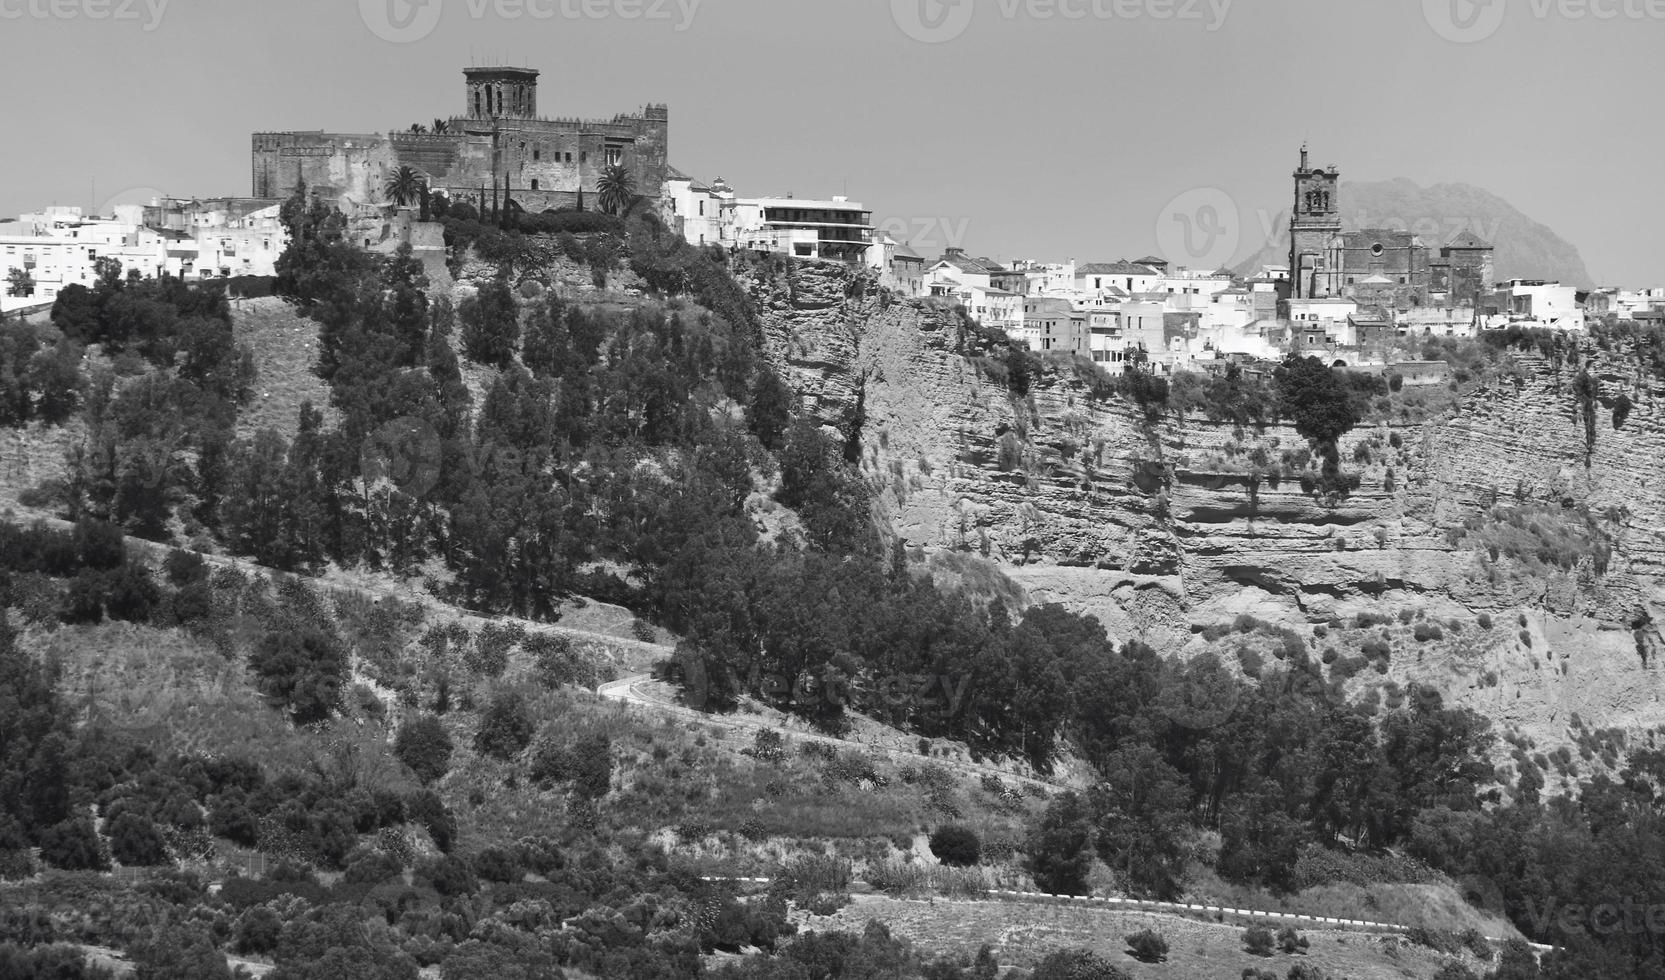 village andalou traditionnel en espagne. arcos de la frontera photo